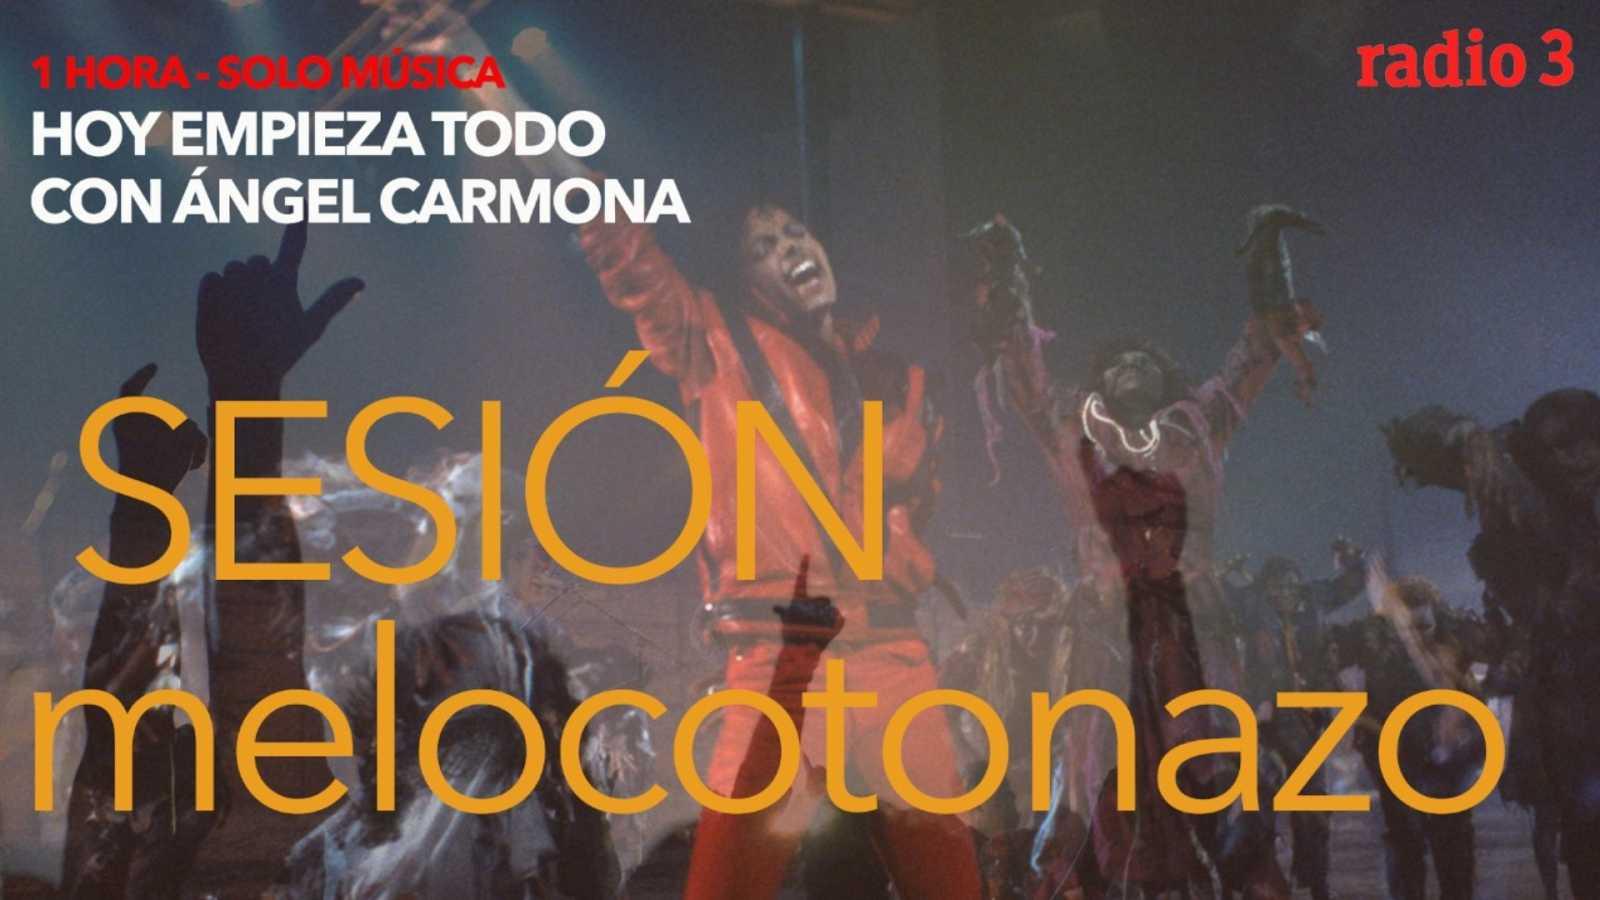 Hoy empieza todo con Ángel Carmona - #SesiónMelocotonazo: Michael Jackson, Black Rebel Motorcycle club, Love of lesbian... - 30/11/20 - escuchar ahora